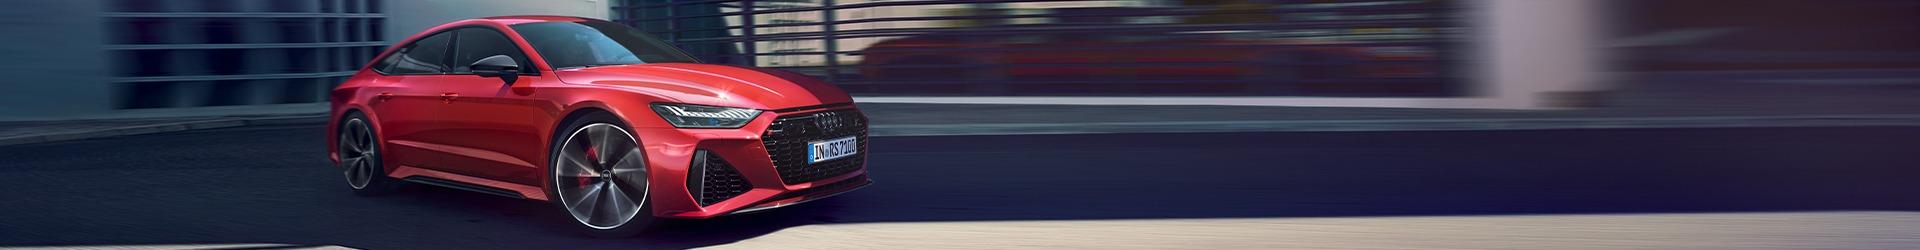 Audi Tire Promotional Image